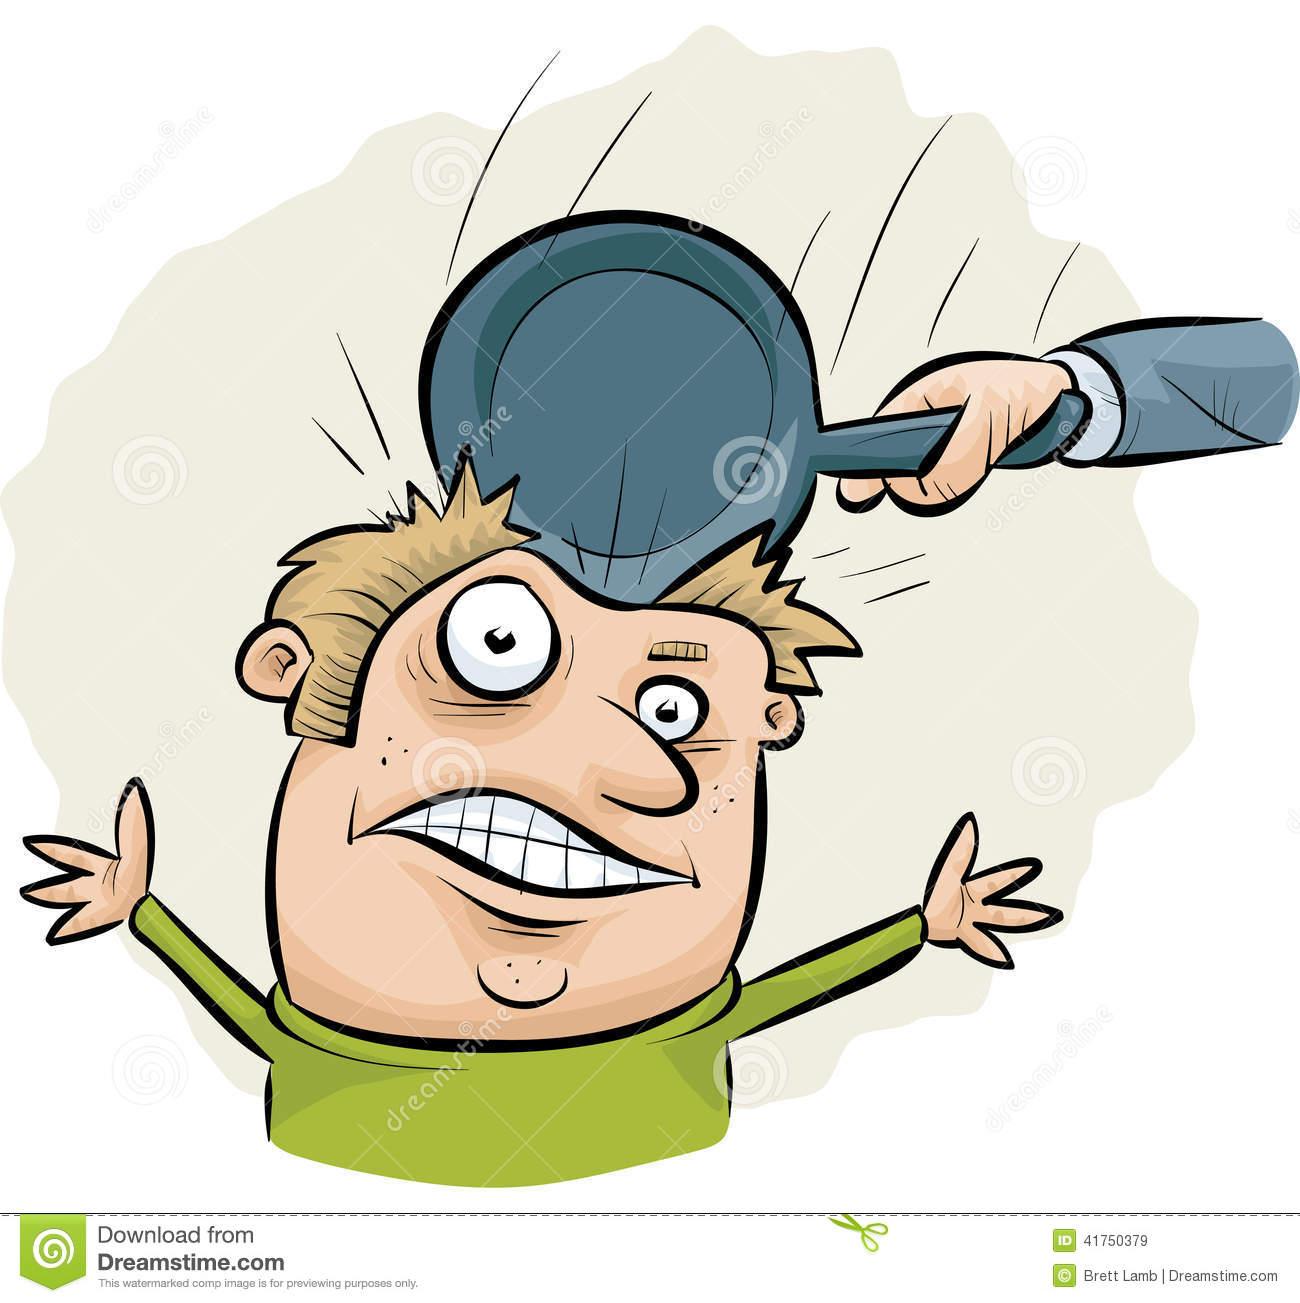 Traumatic brain injury clipart.